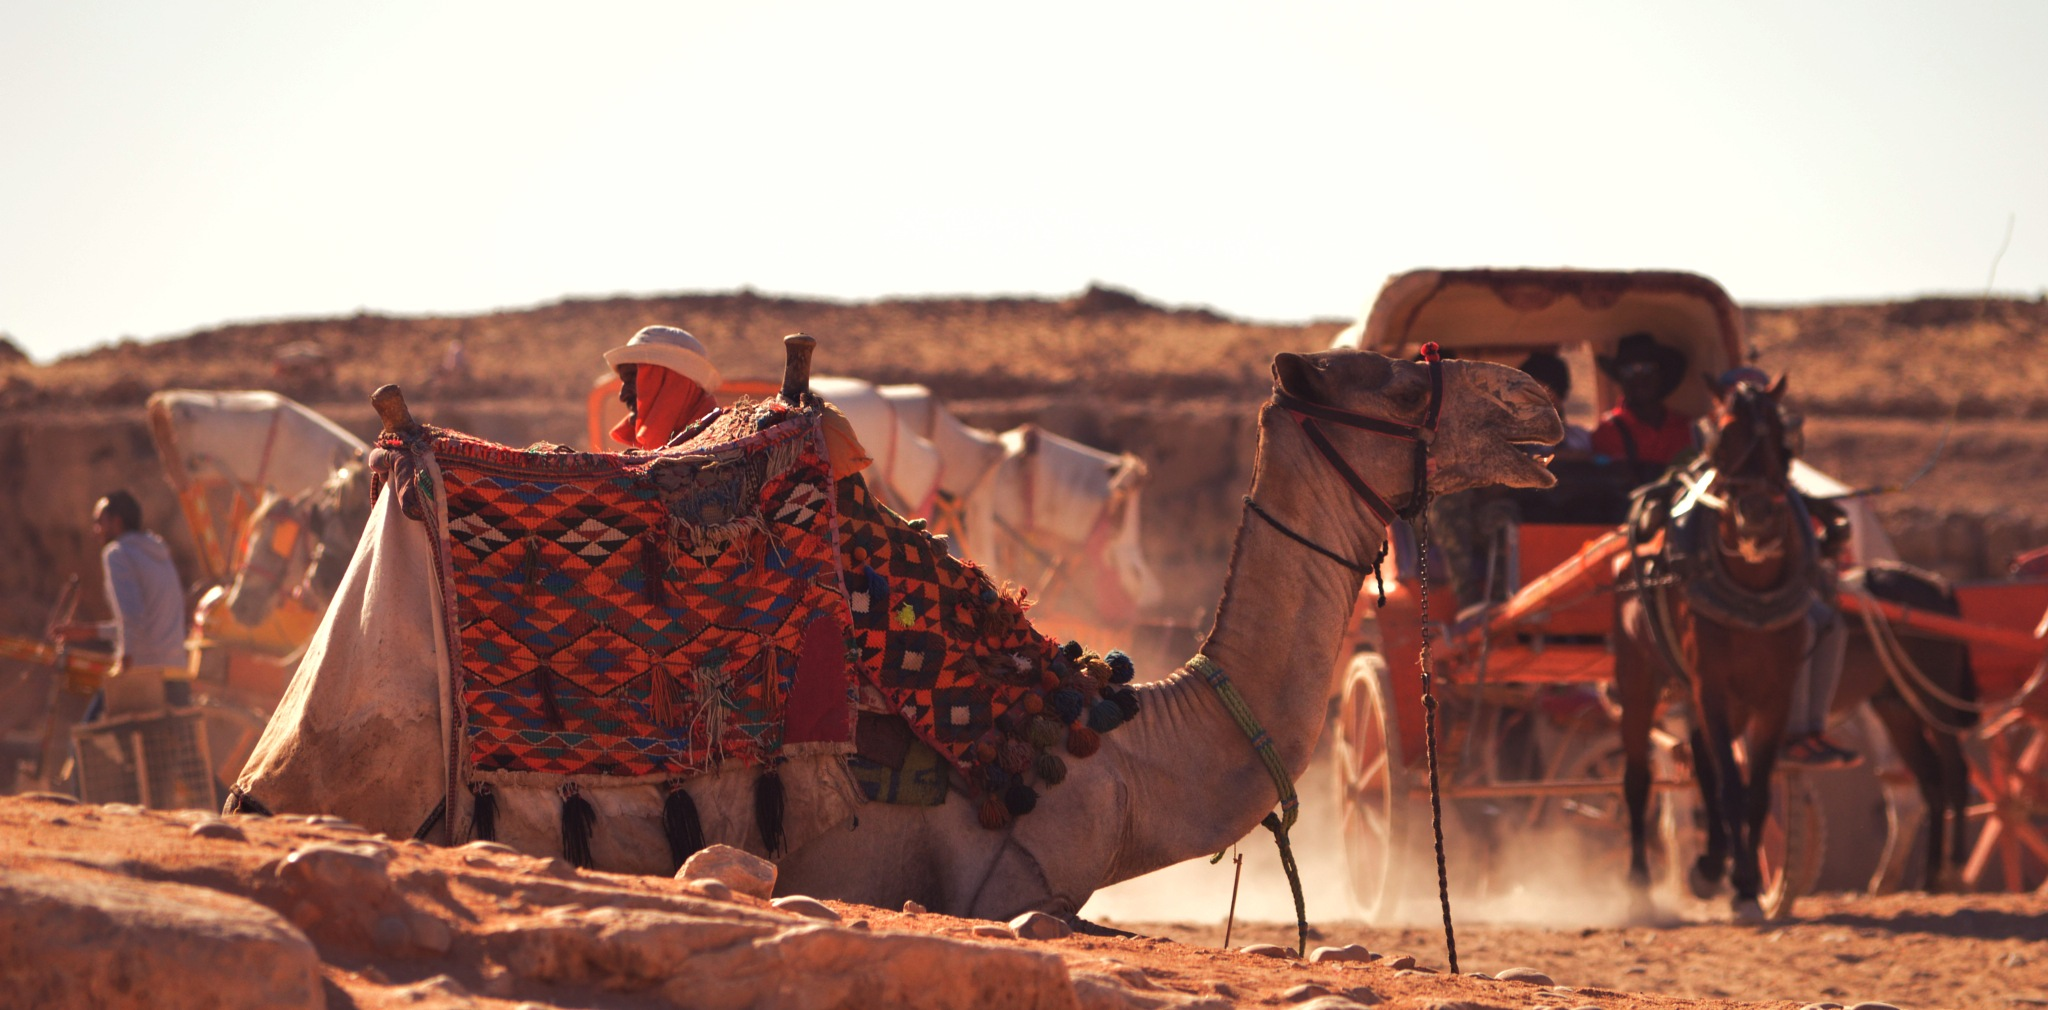 Camel, the symbol of desert  by Attia Awadh